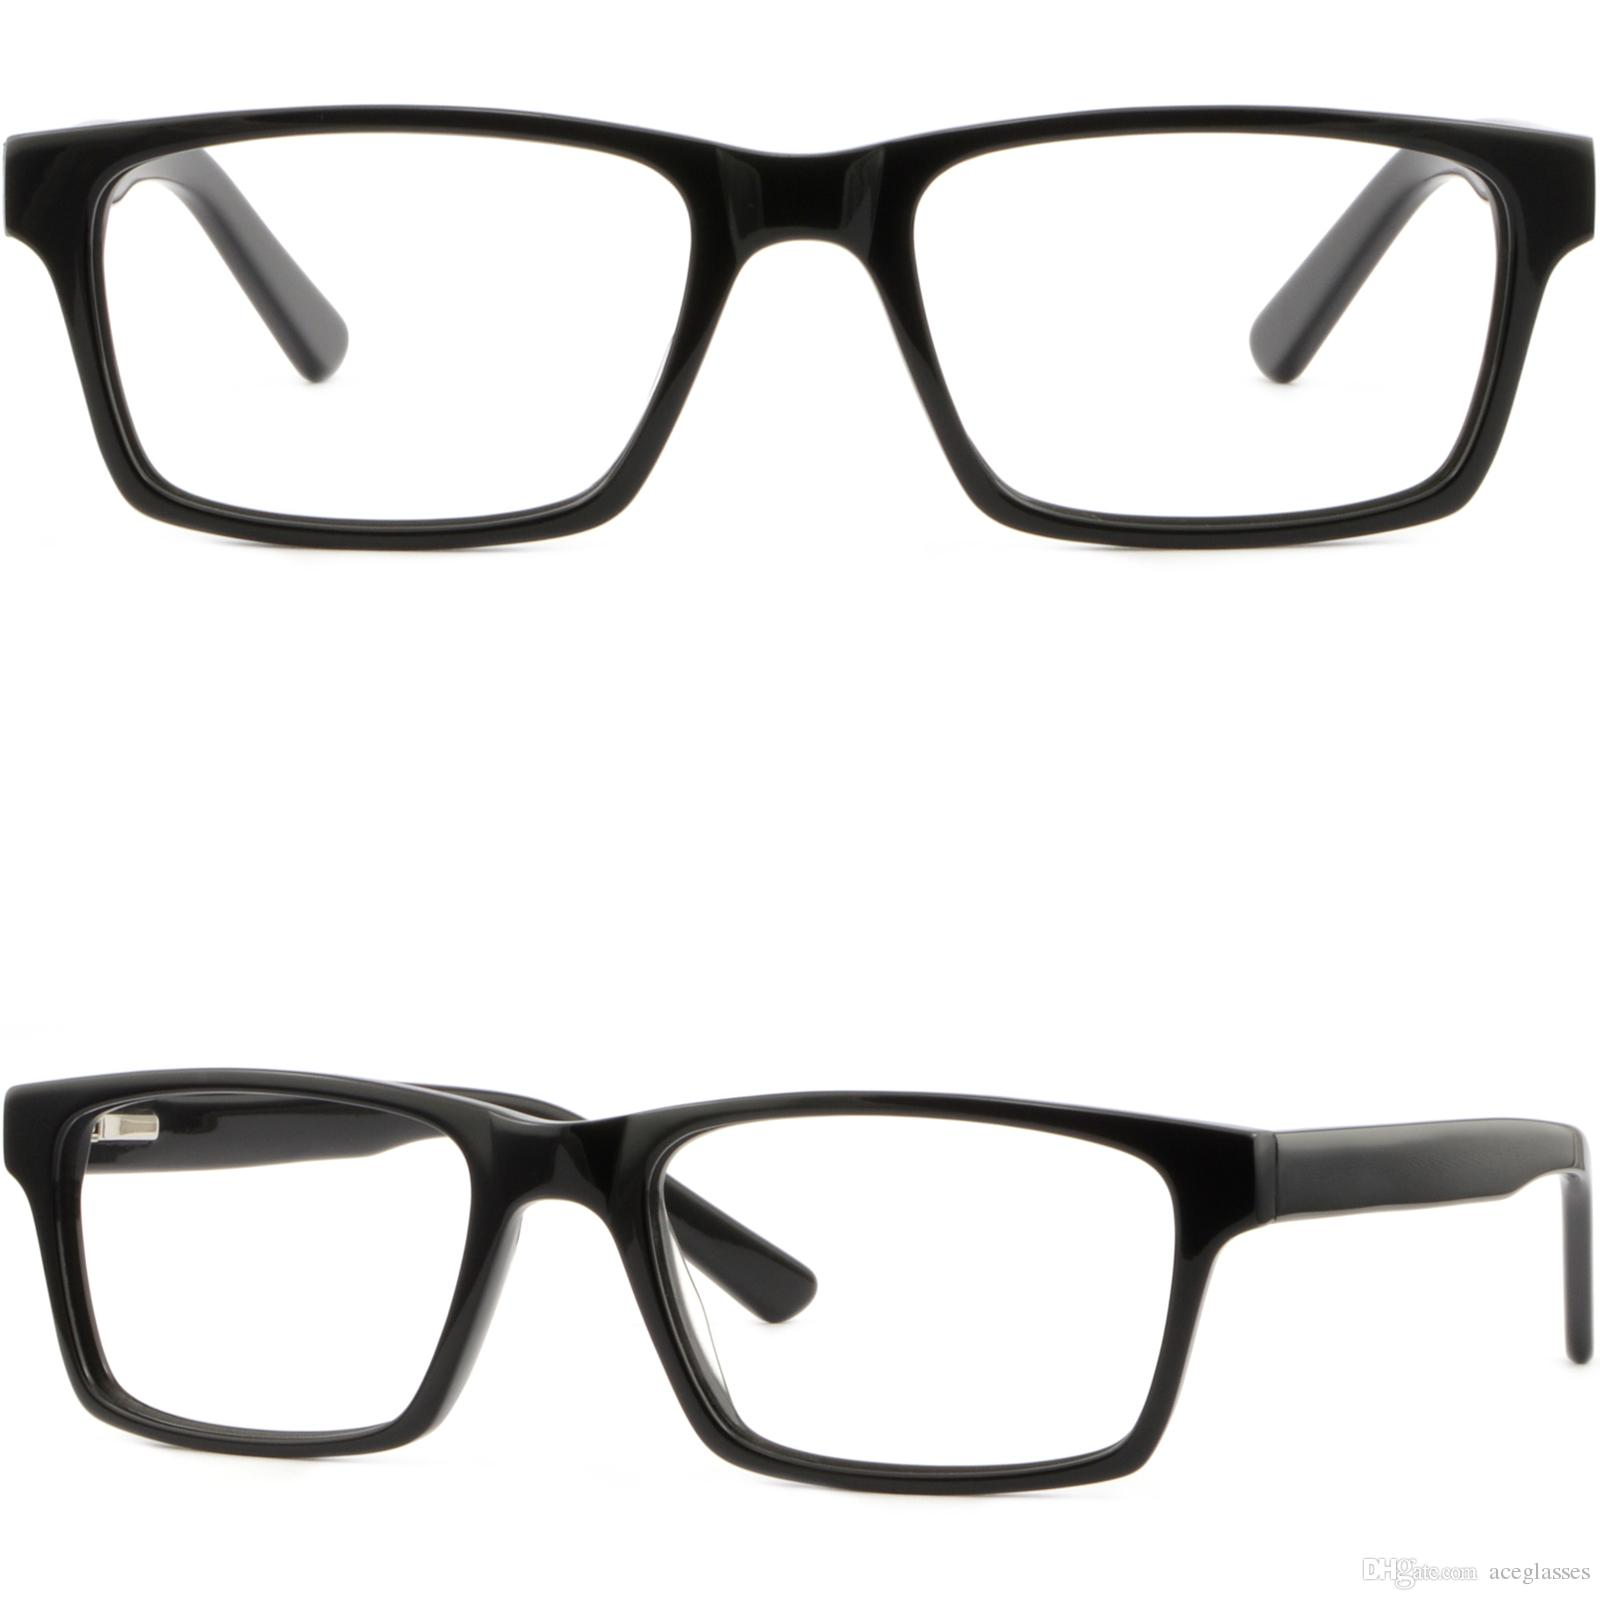 rectangle mens womens plastic frames prescription glasses rectangular eyeglasses discount designer eyeglass frames discount eyeglasses frames from - Discount Eyeglass Frames